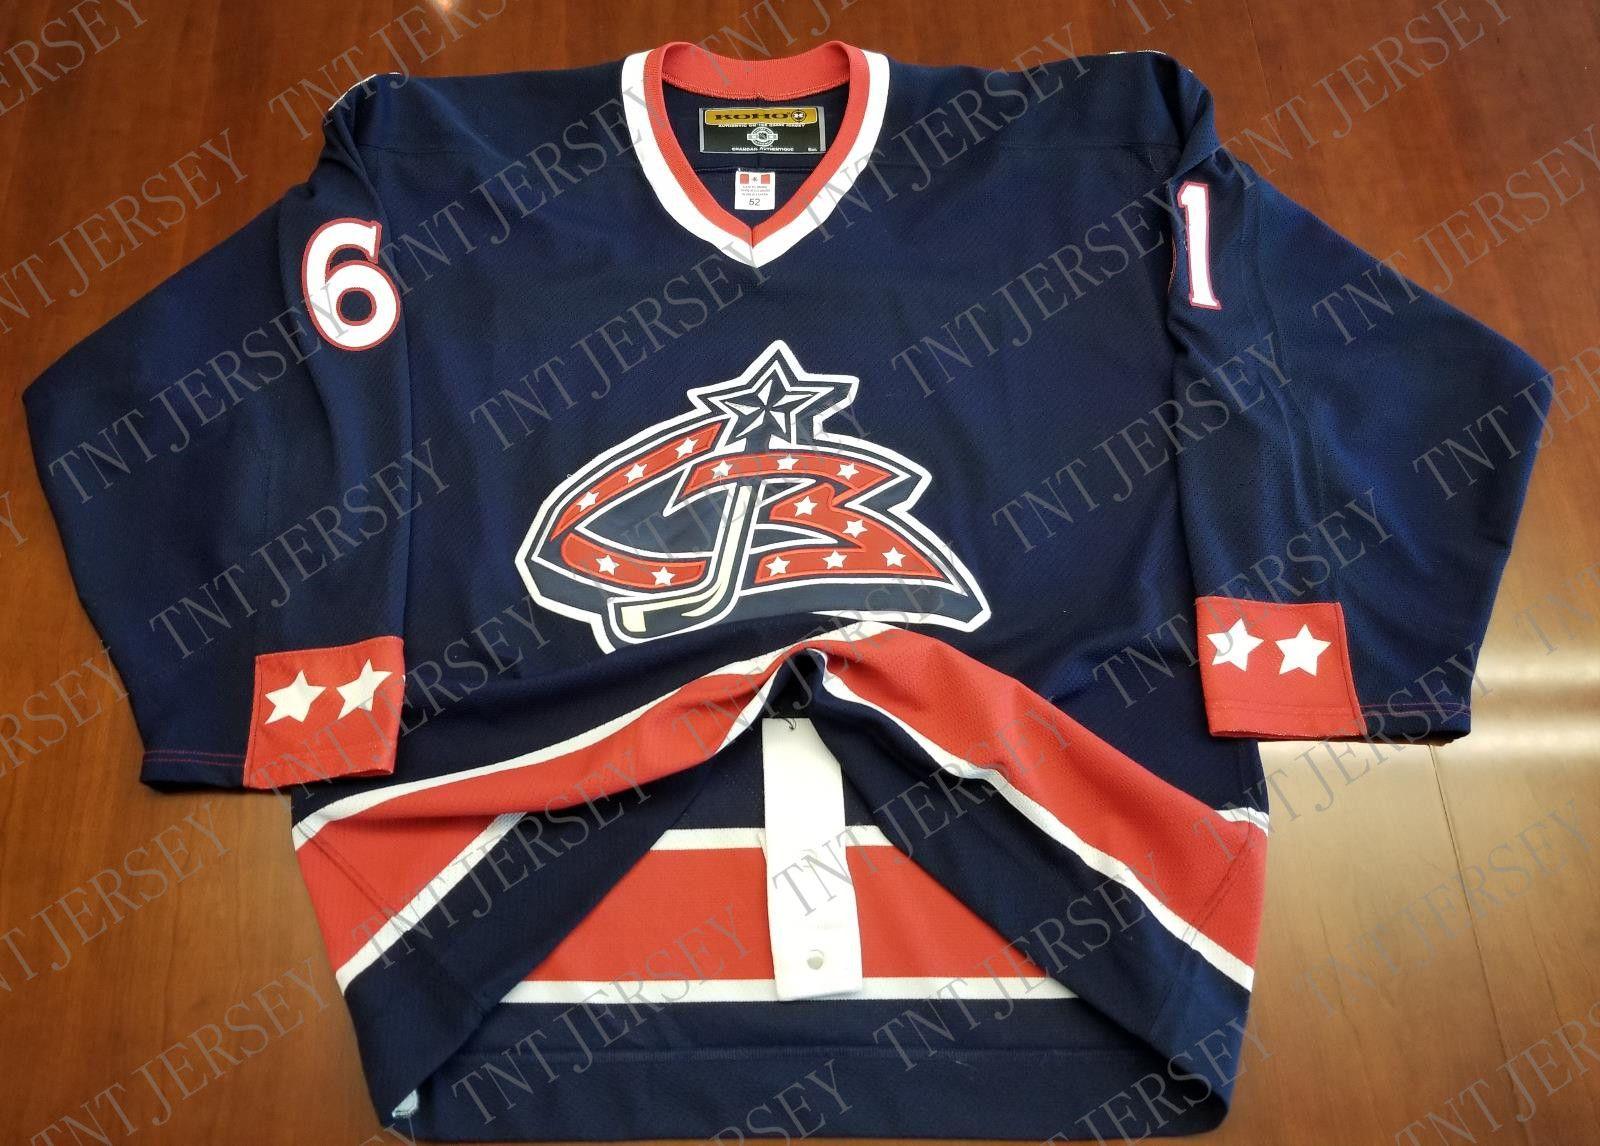 new products 908ea 9d6fe Cheap custom Rick Nash Vintage Columbus Blue Jackets Koho Center Ice Jersey  Stitched Retro Hockey Jersey XS-5XL